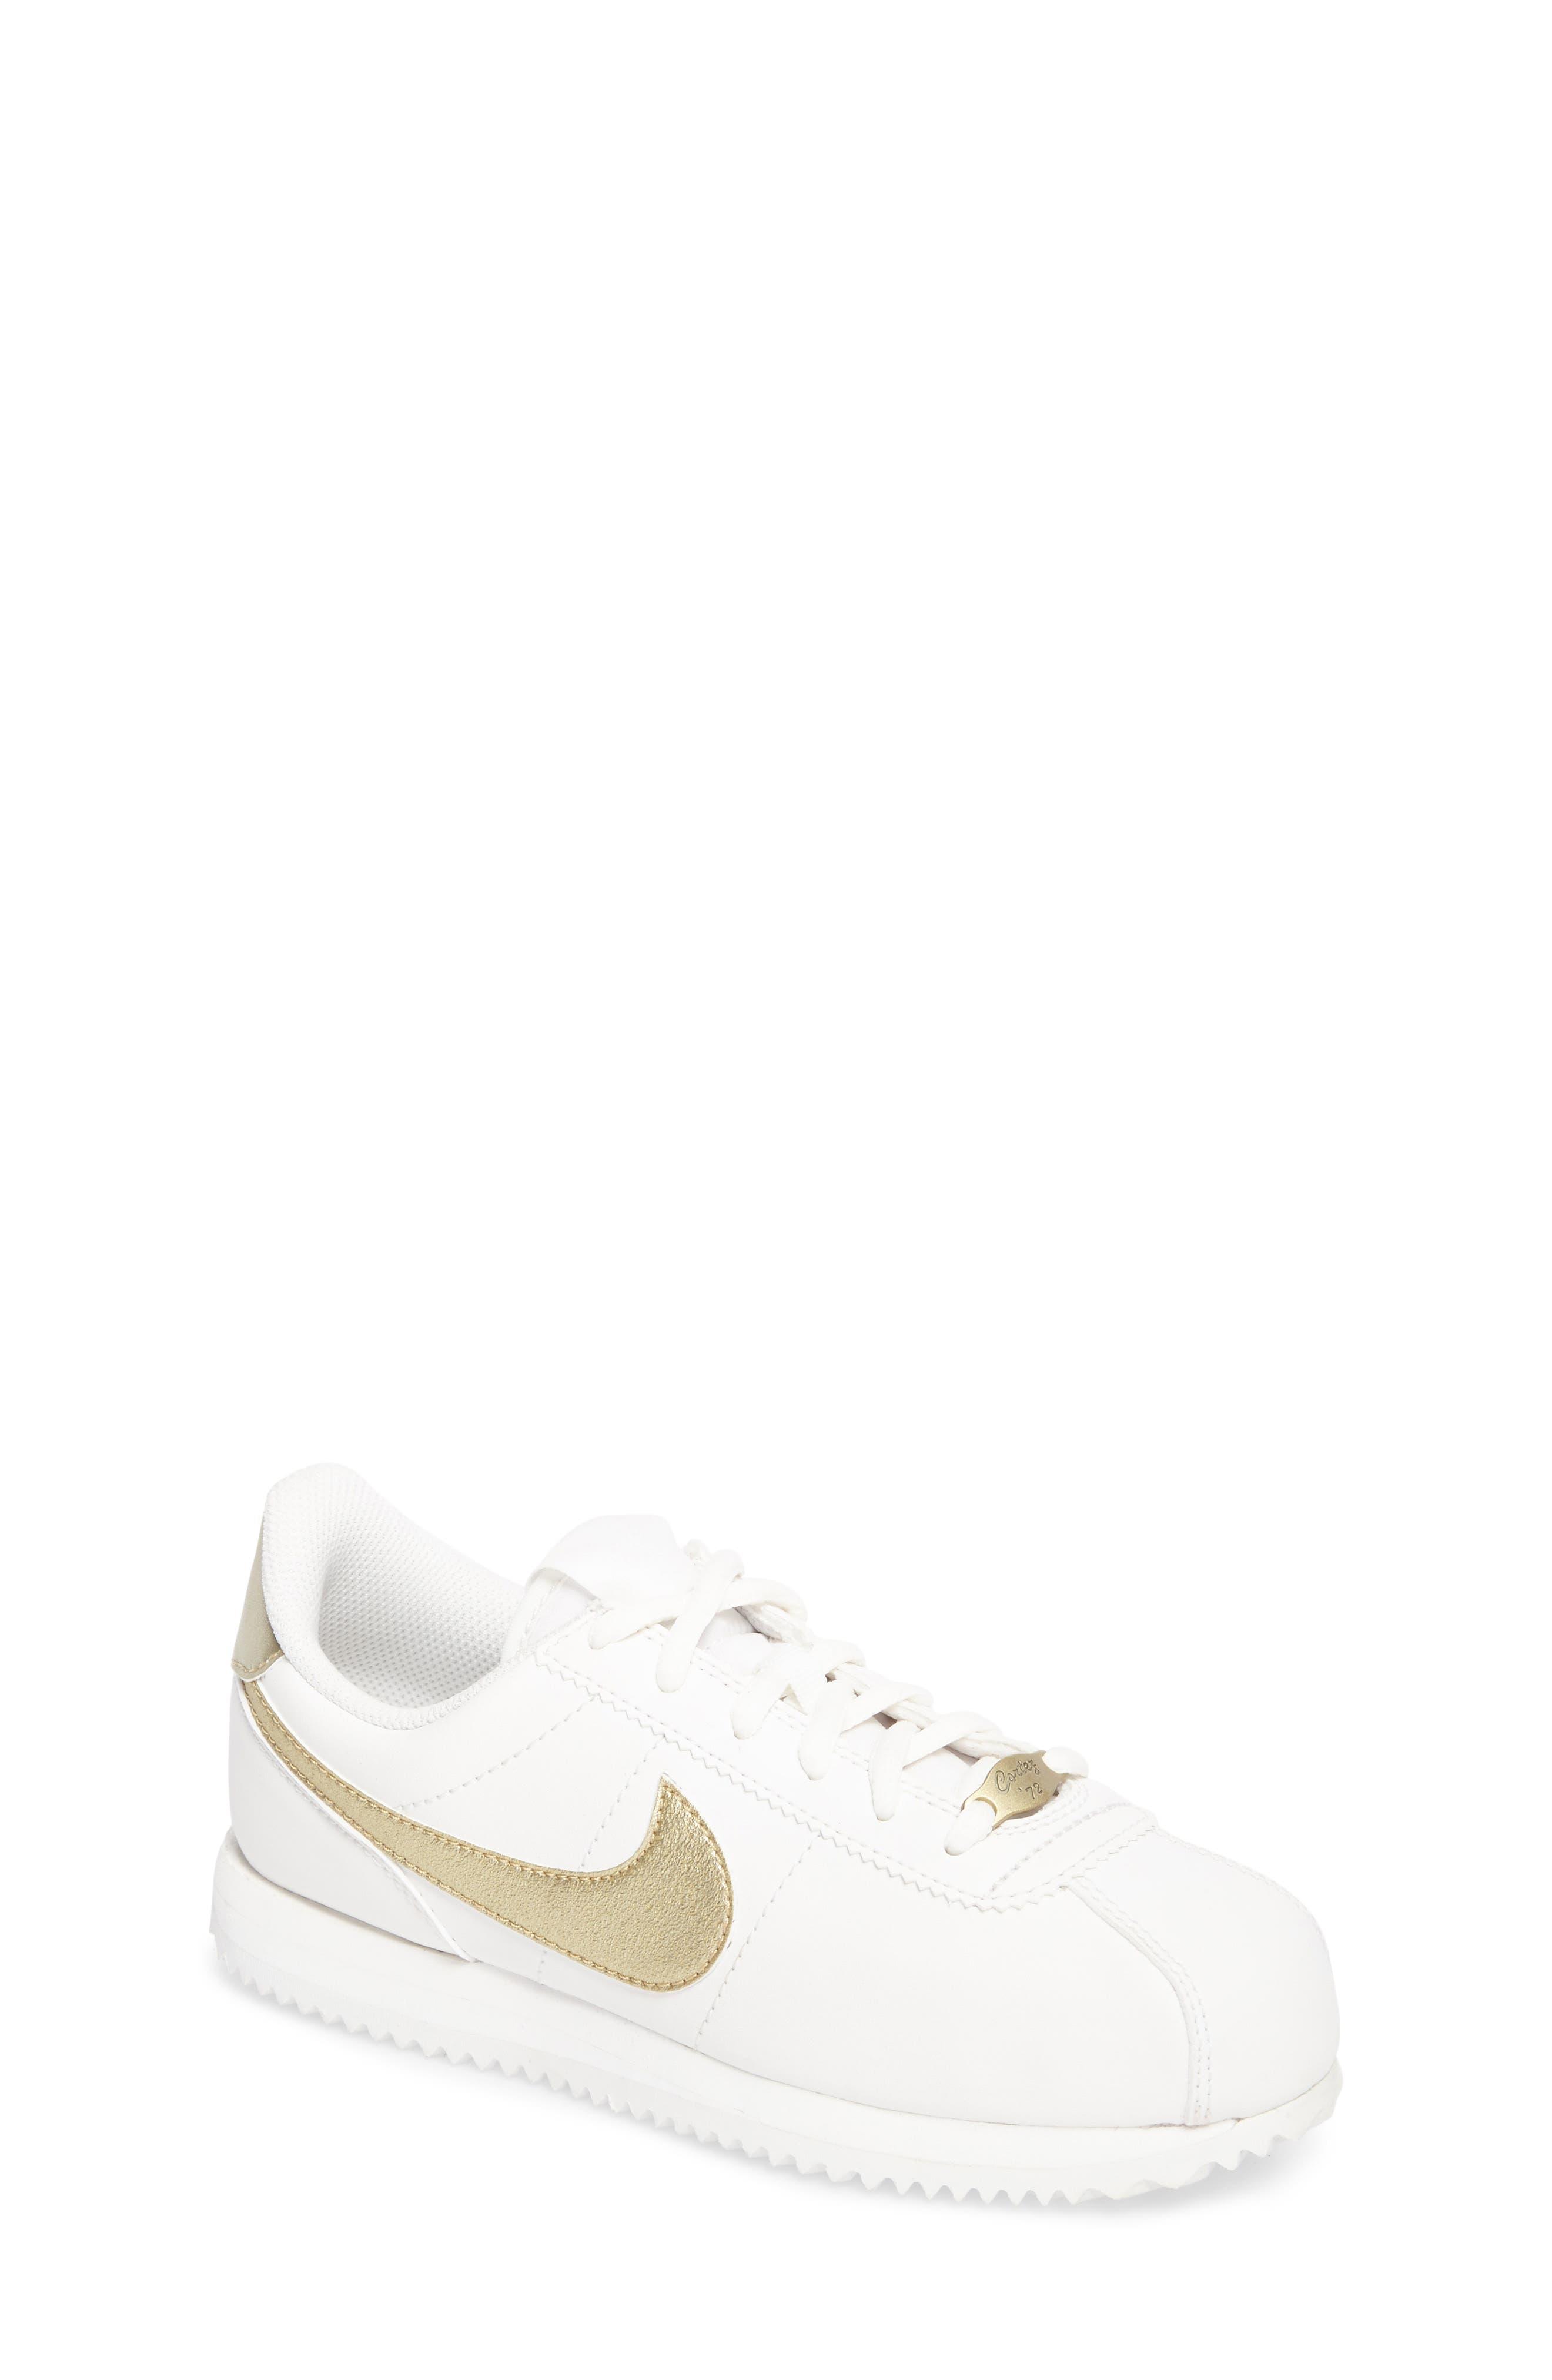 Alternate Image 1 Selected - Nike Cortez Basic SL Sneaker (Toddler, Little Kid & Big Kid)